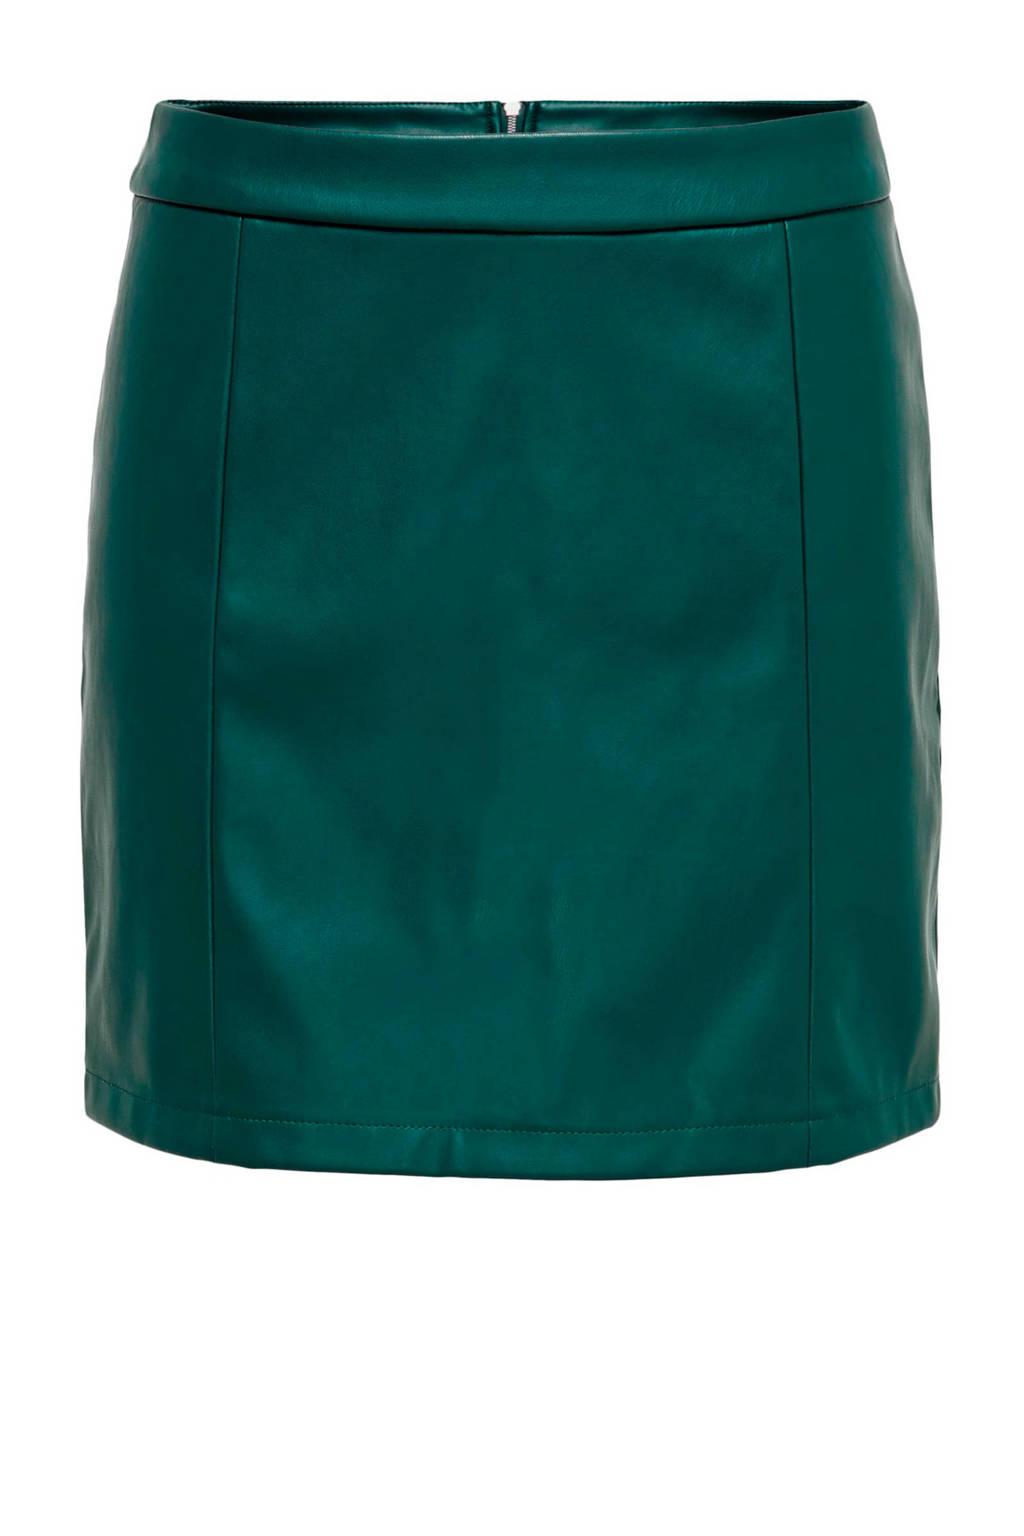 JACQUELINE DE YONG imitatieleren rok groen, Groen